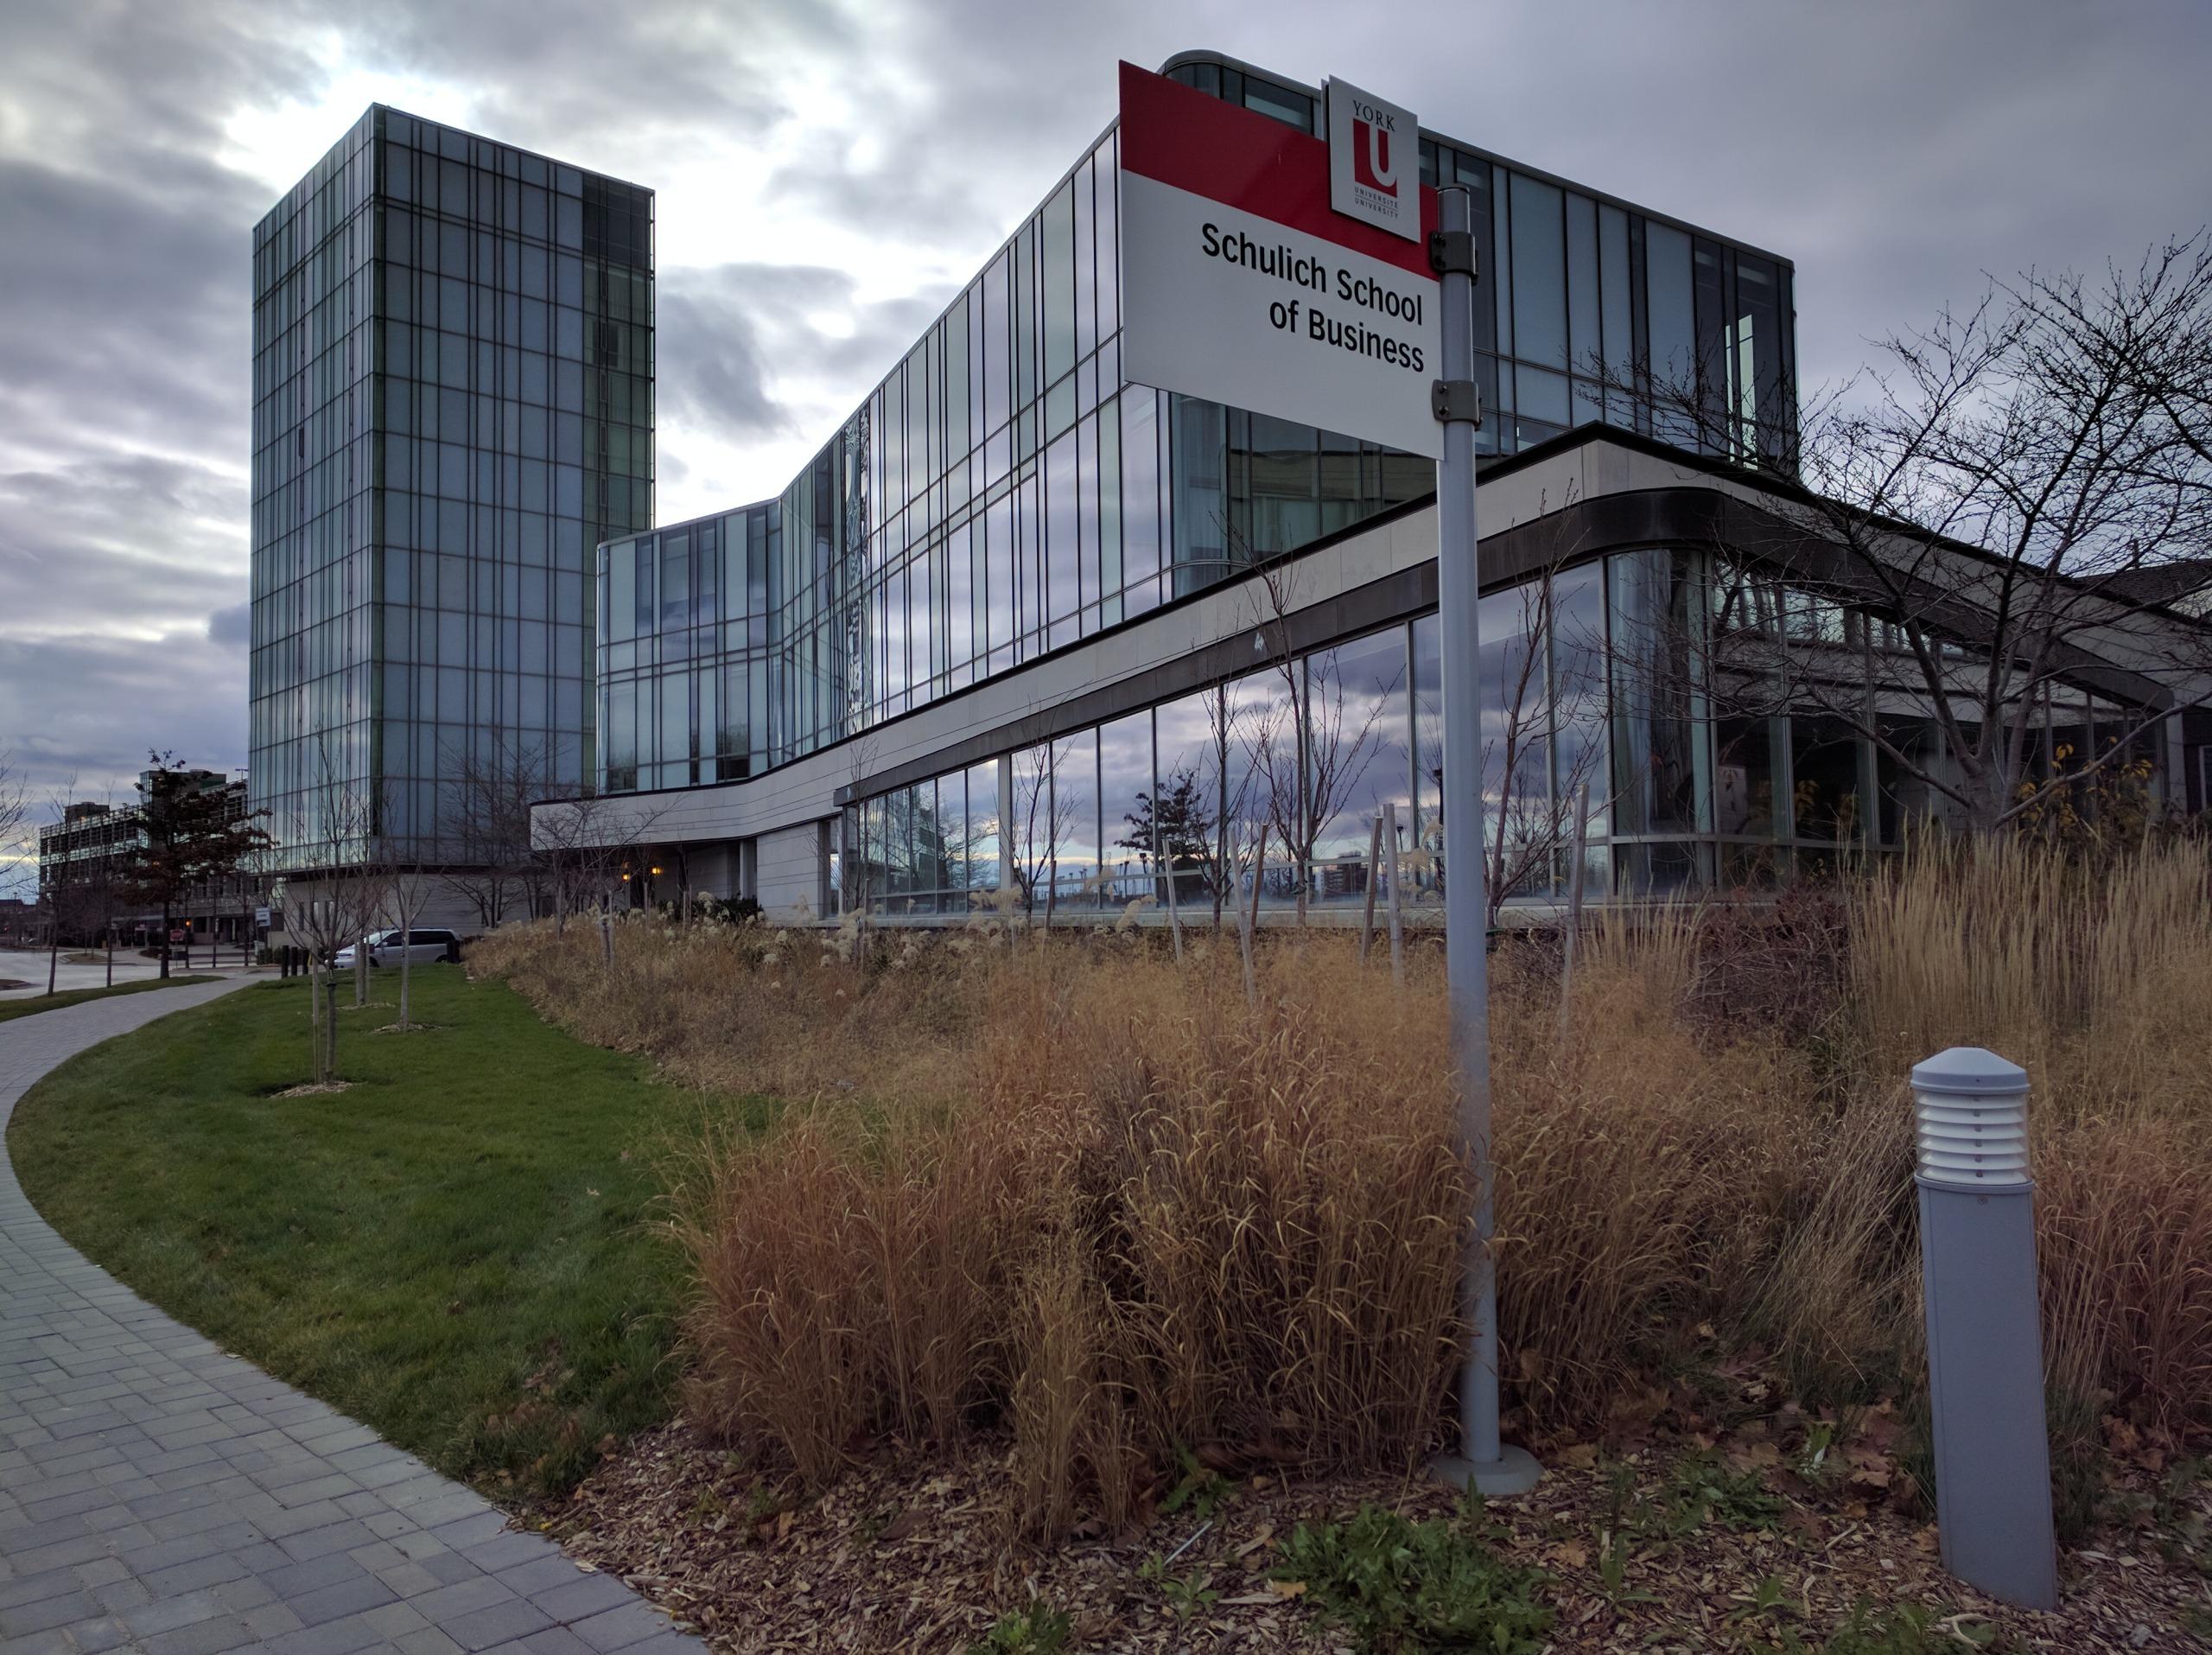 Schulich School of Business - business schools in Canada